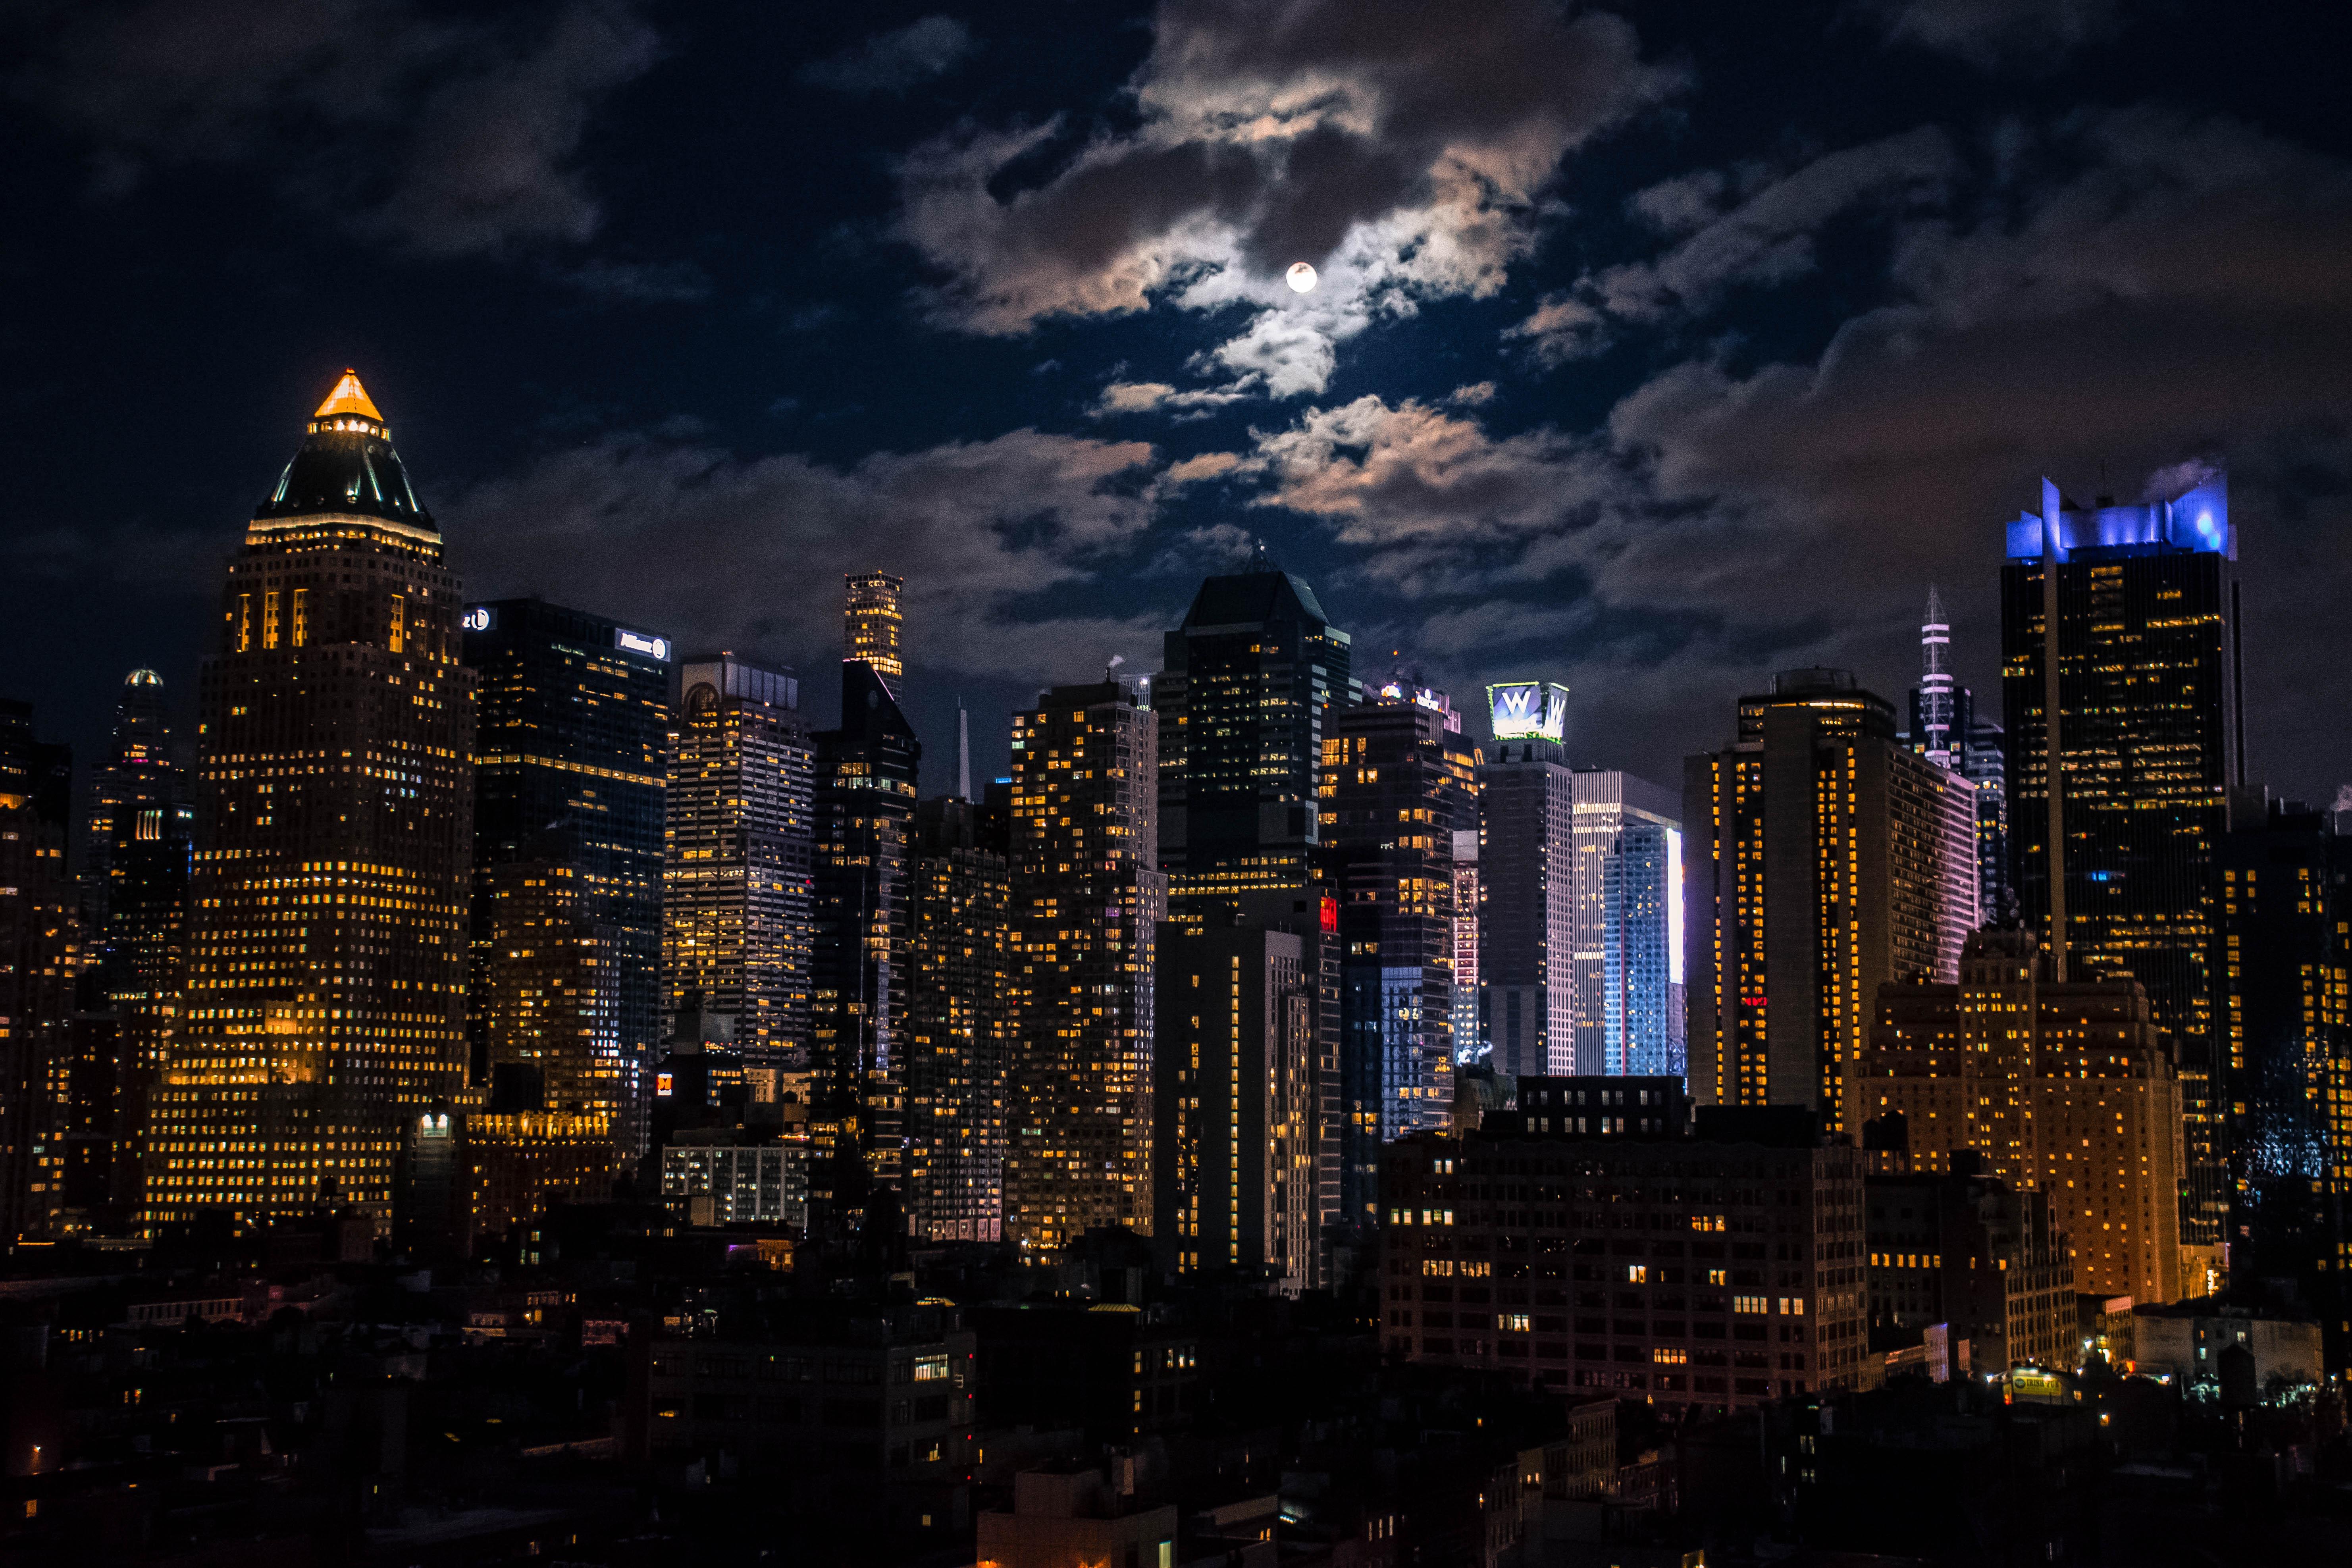 Stunning Photograph Shows The Full Moon Illuminating The